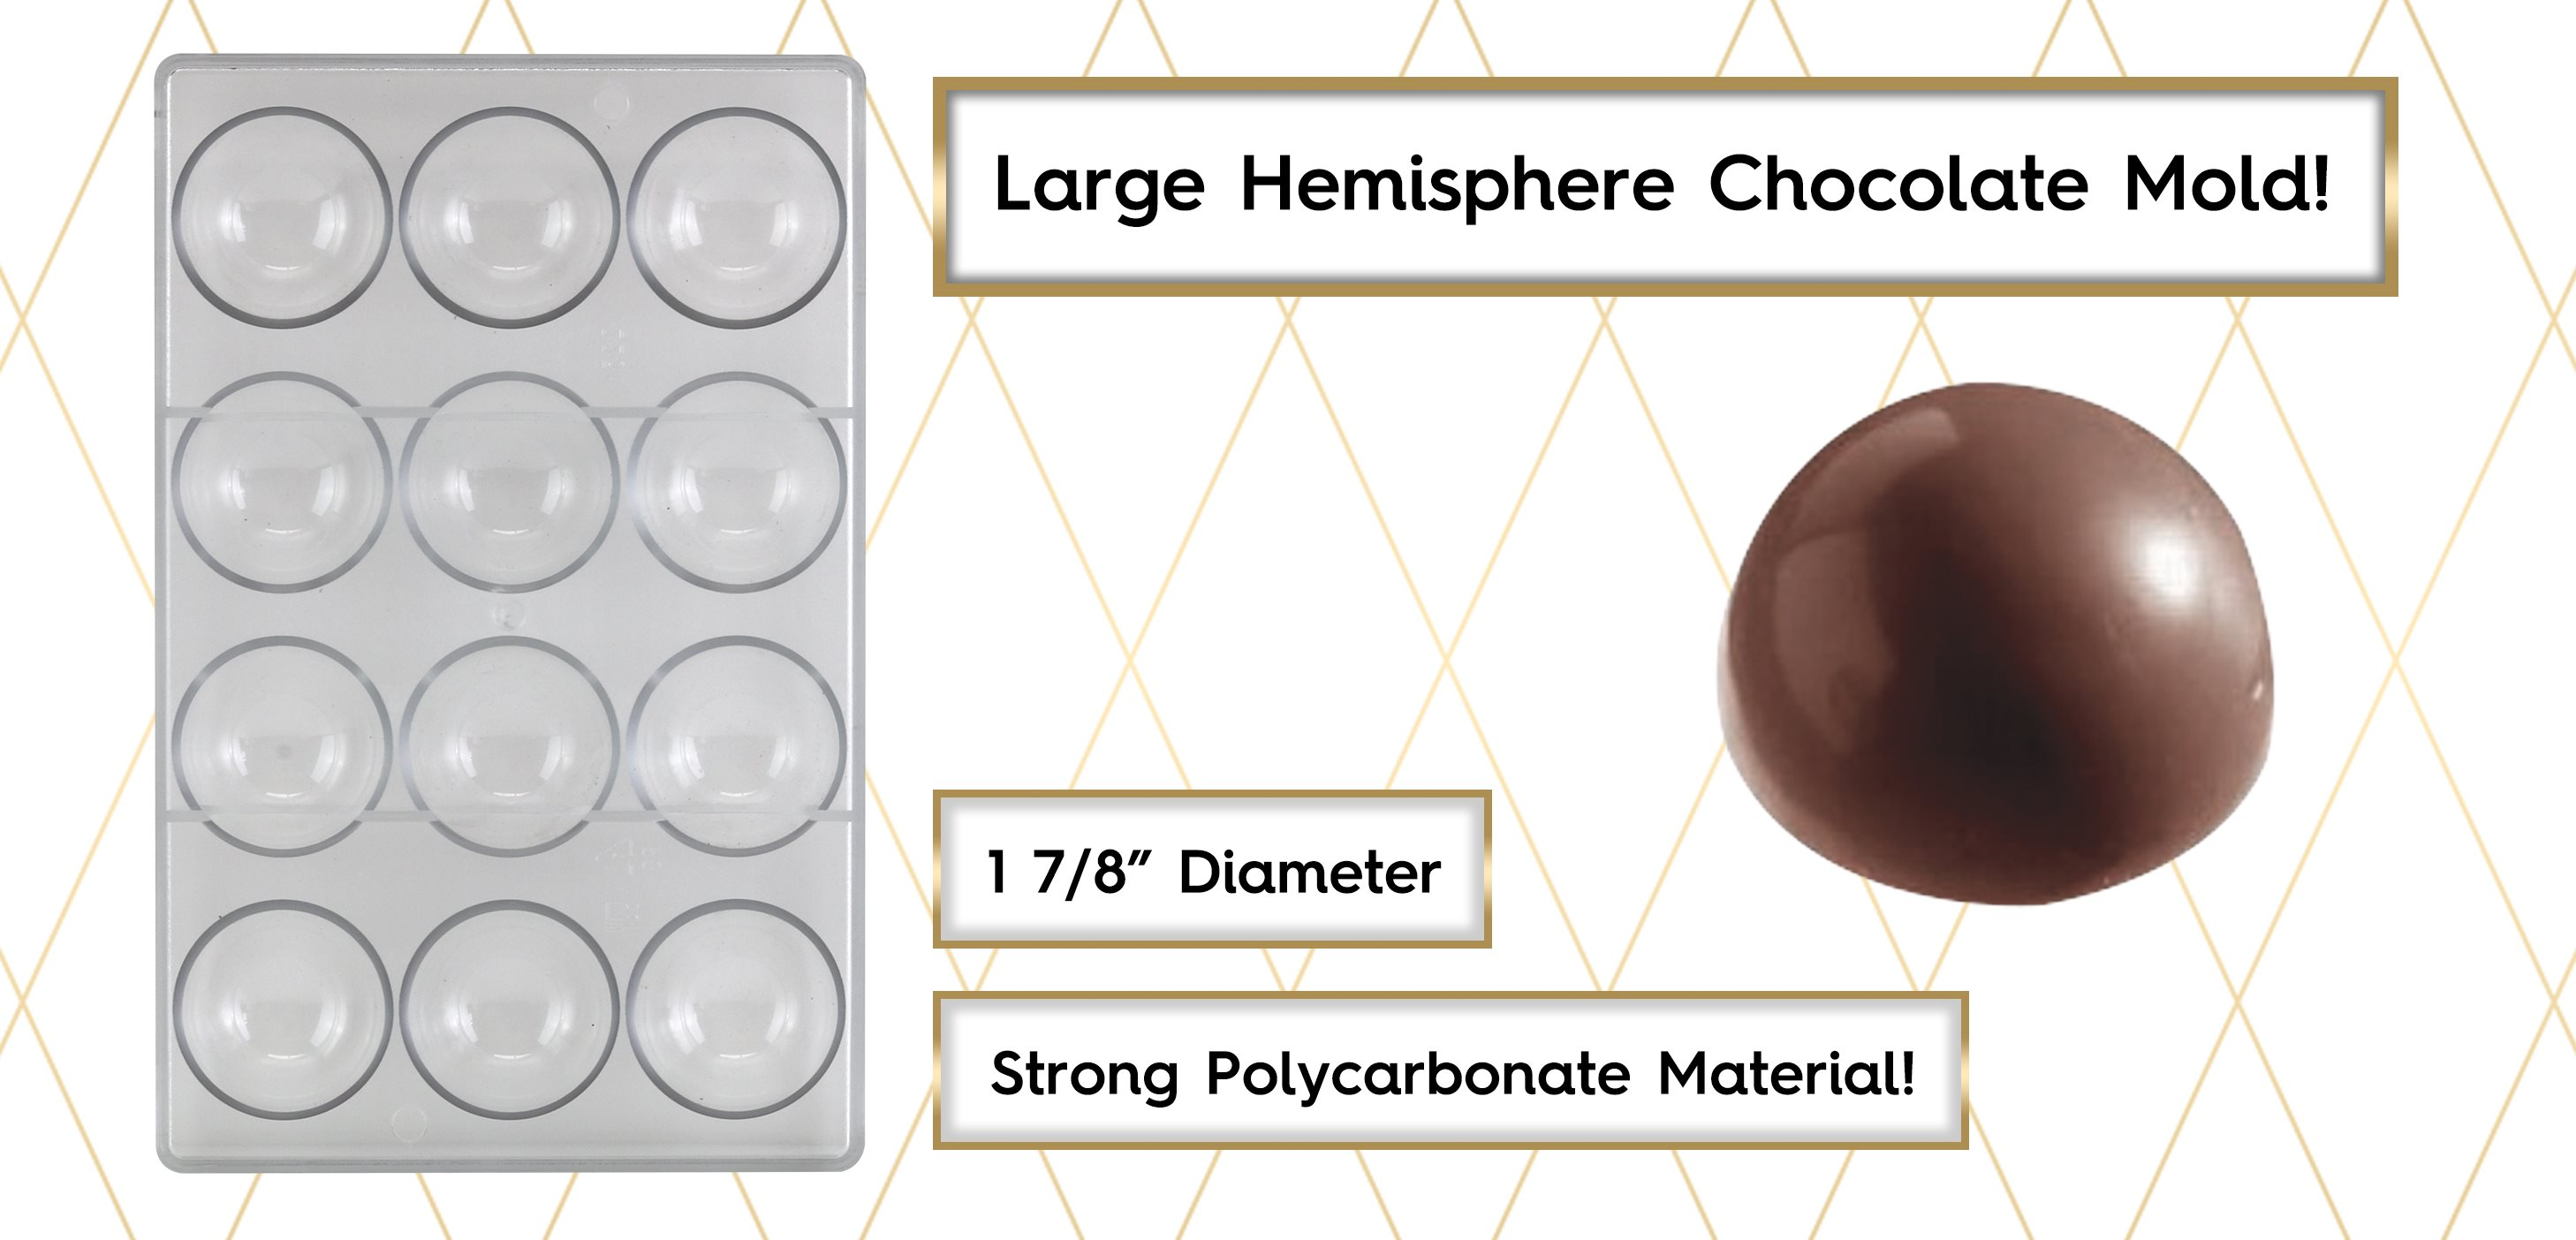 Hemisphere Chocolate Mold